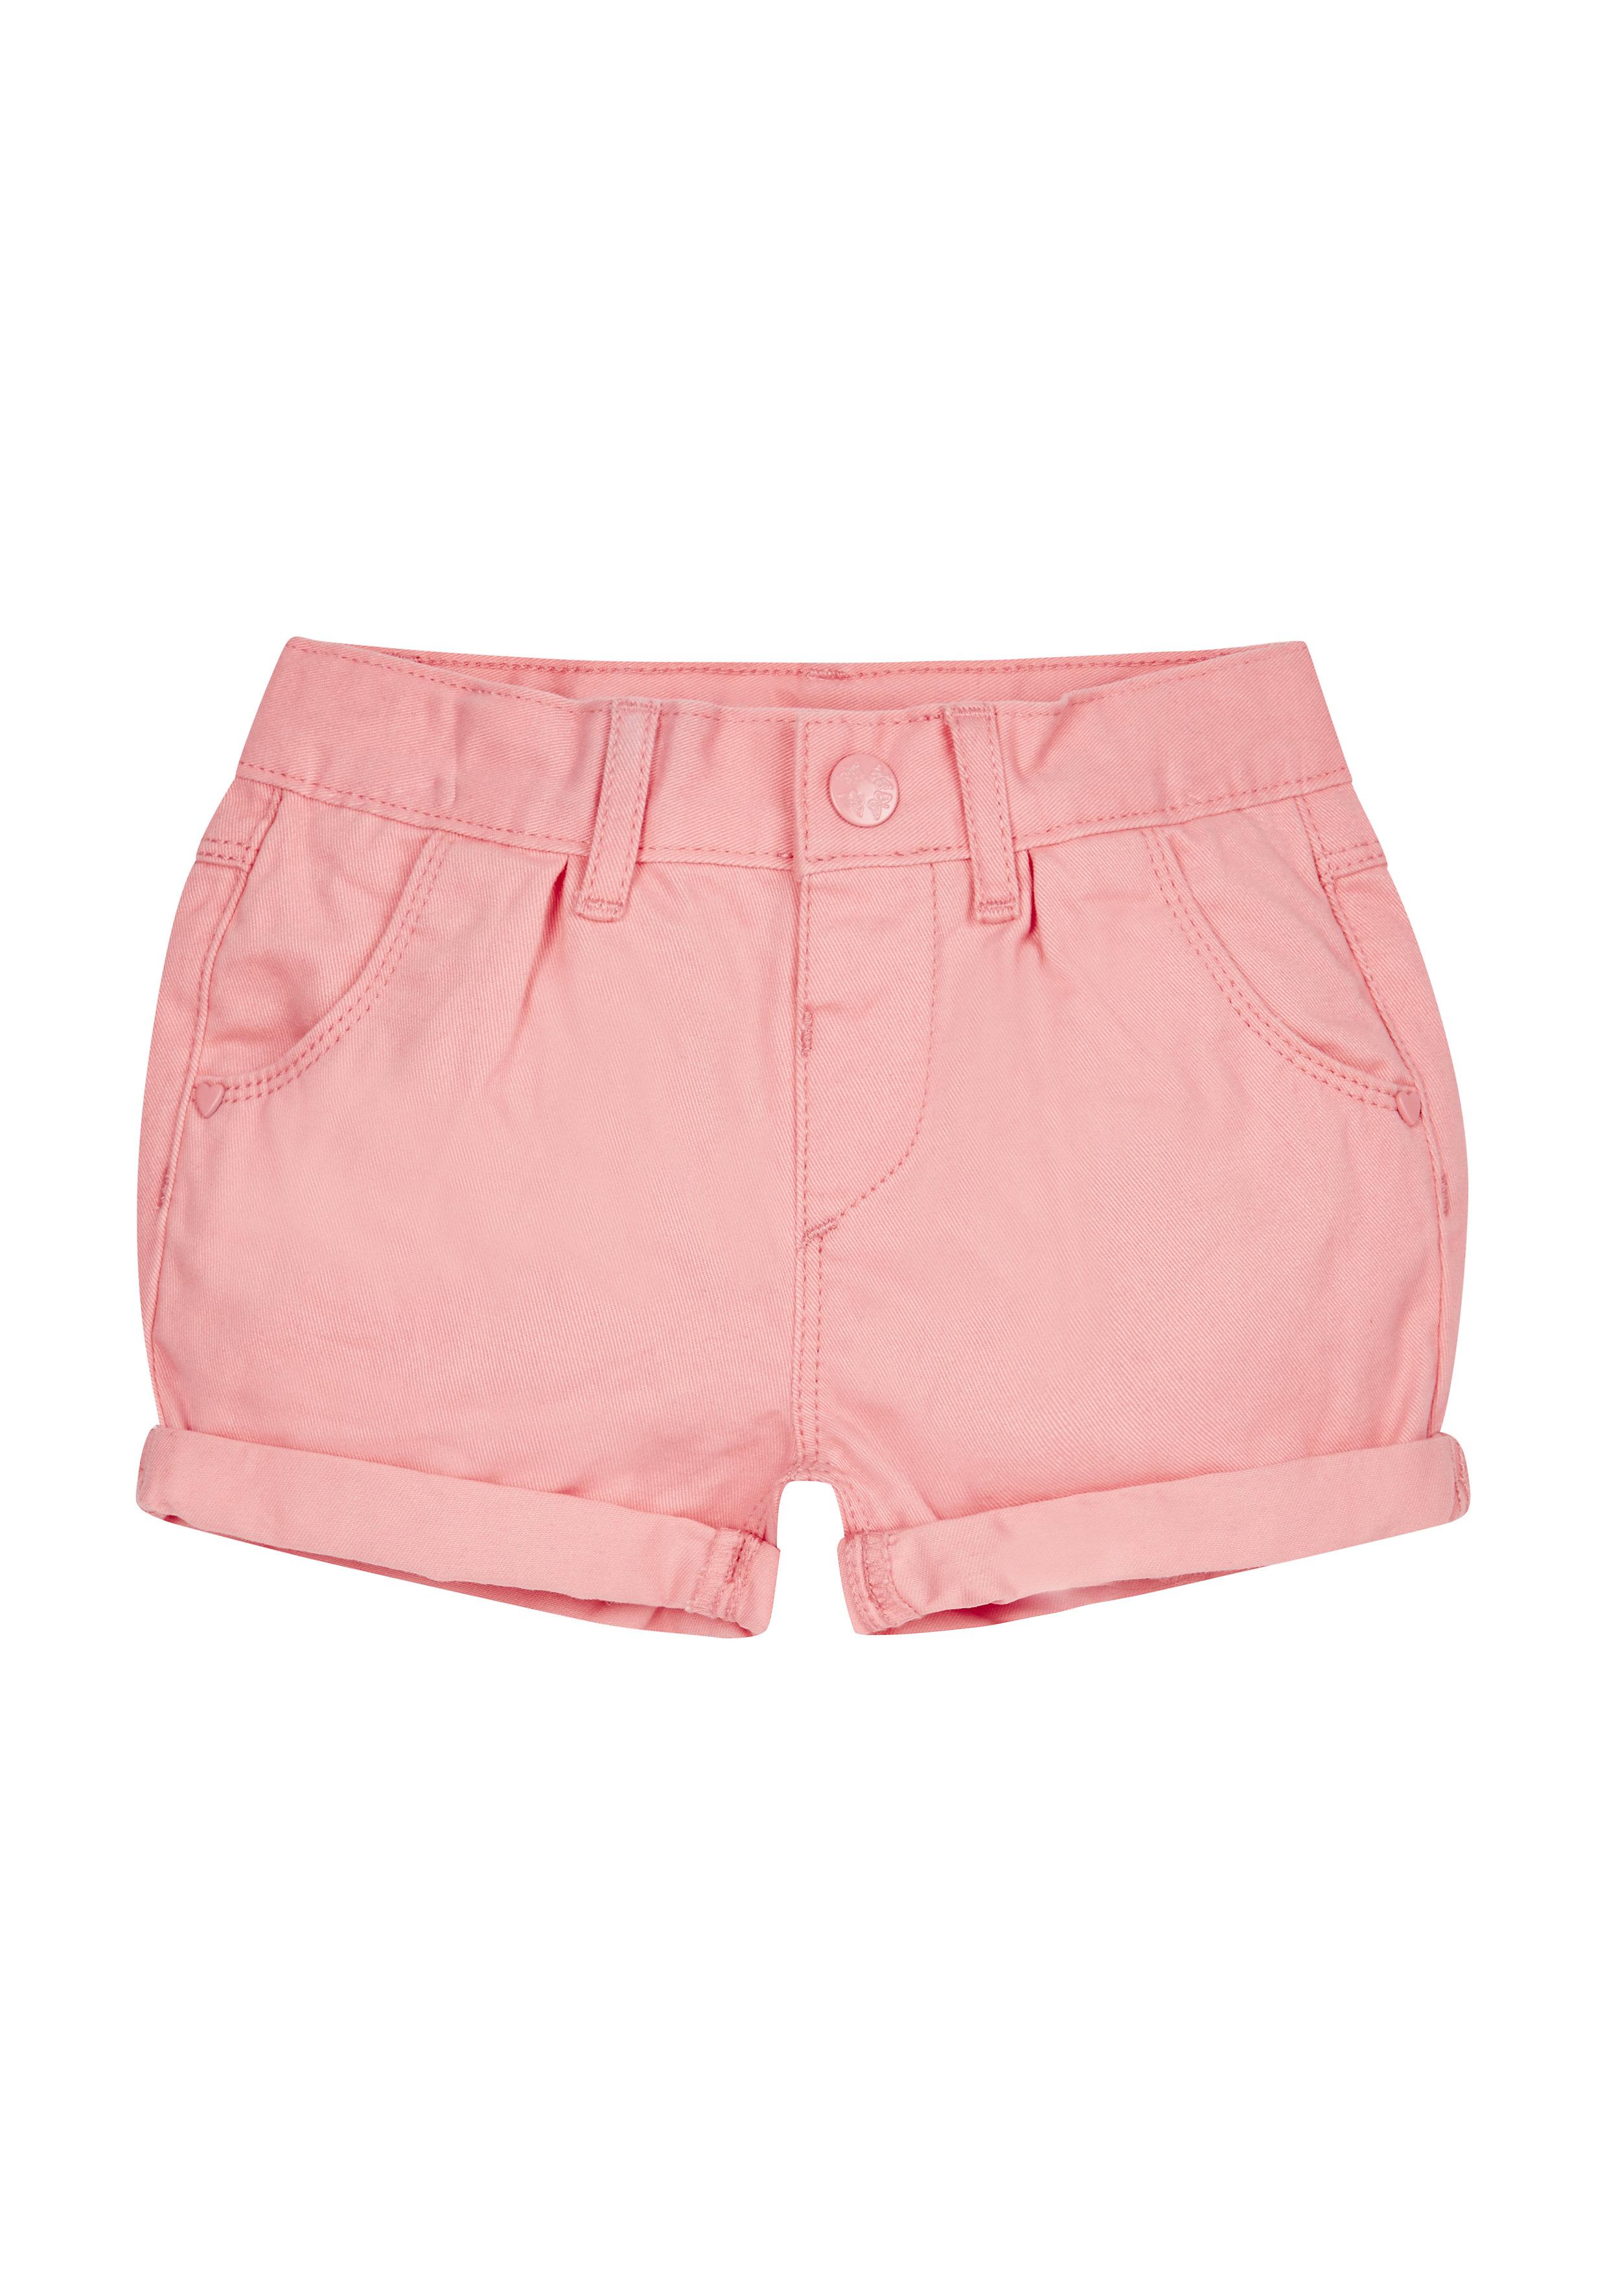 Mothercare   Girls Denim Shorts - Coral